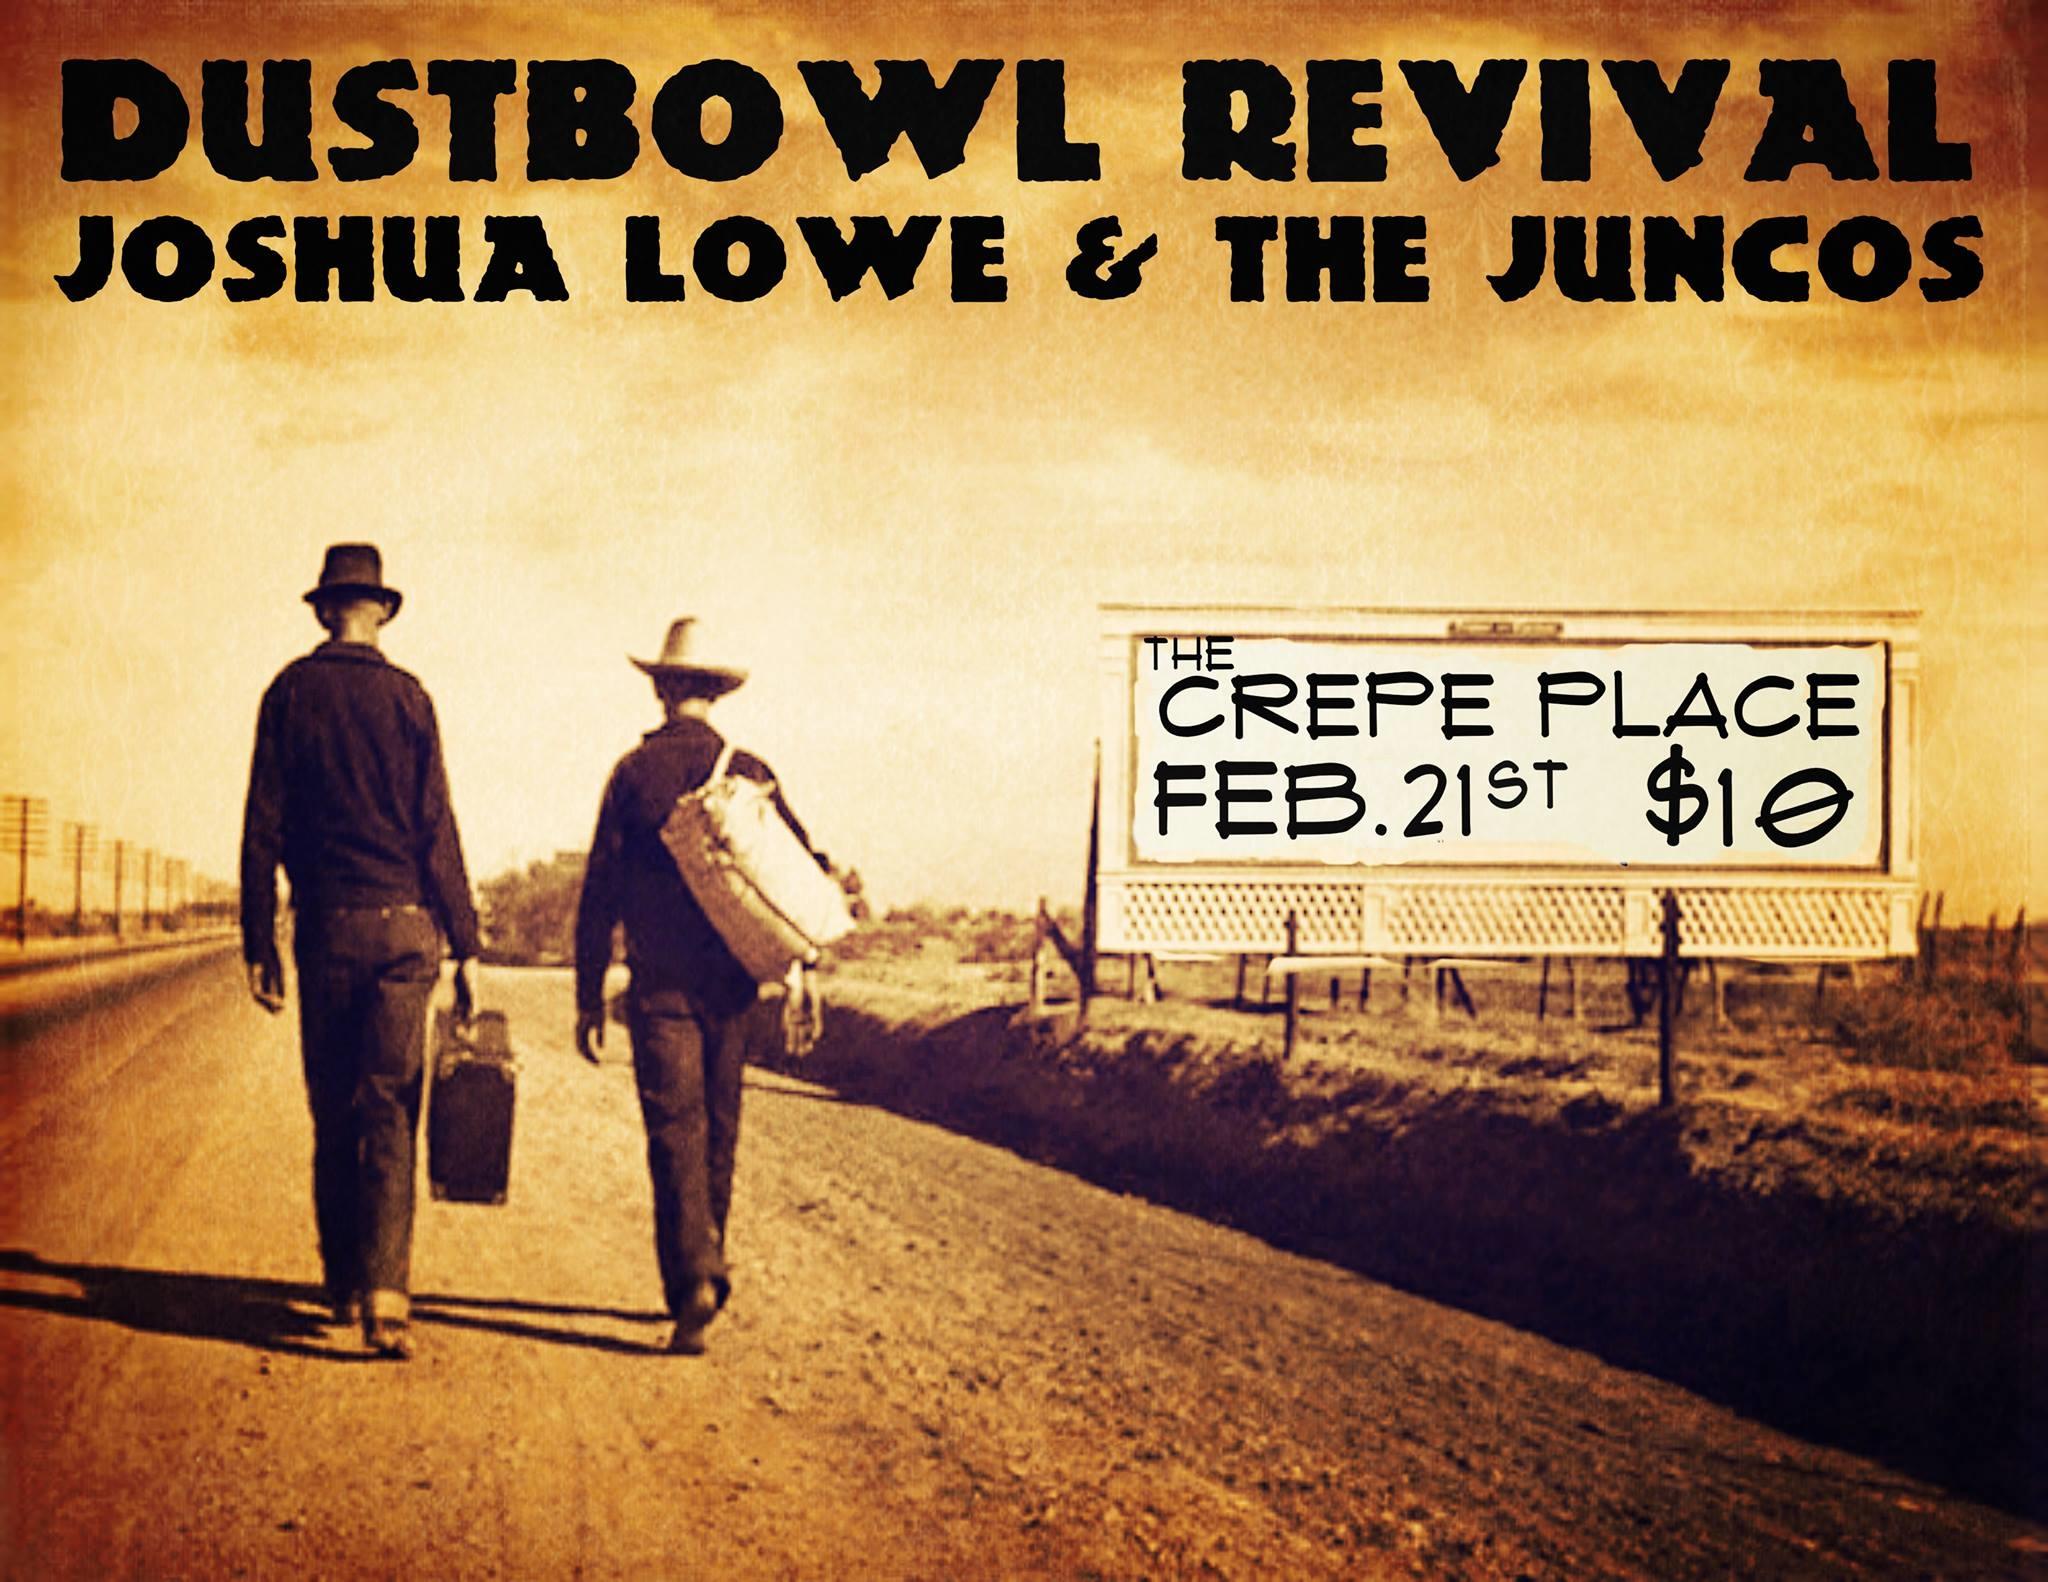 Dustbowl Revival 2-21-14.jpg